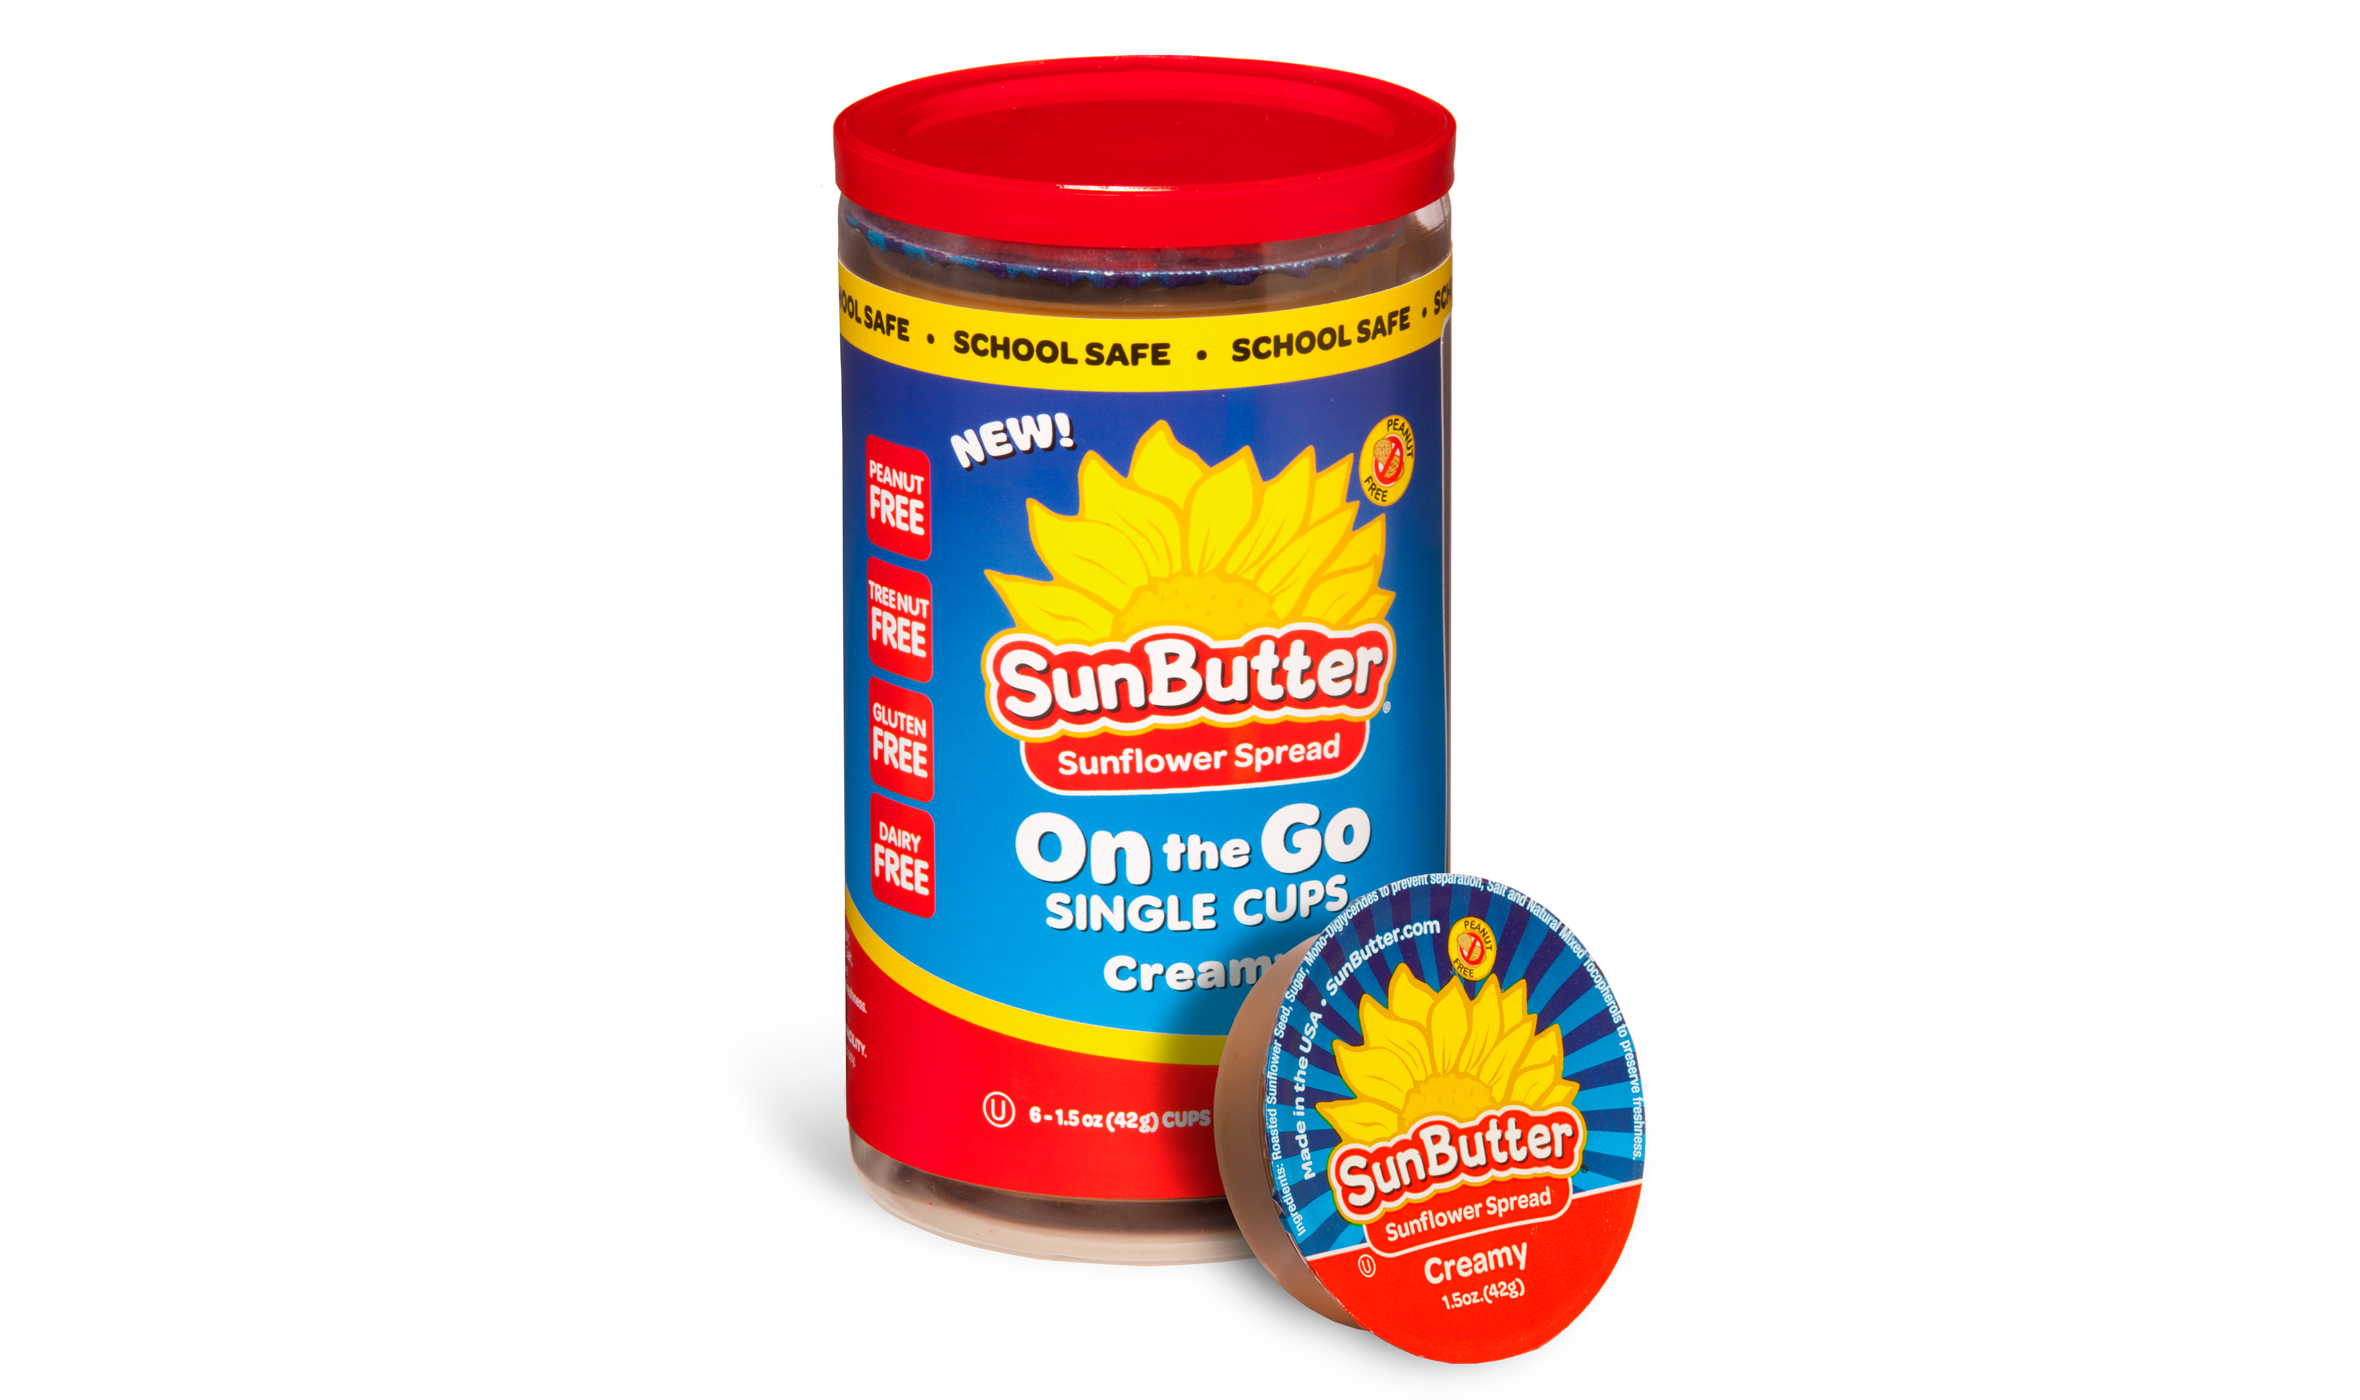 SunButter_6cupCylinder